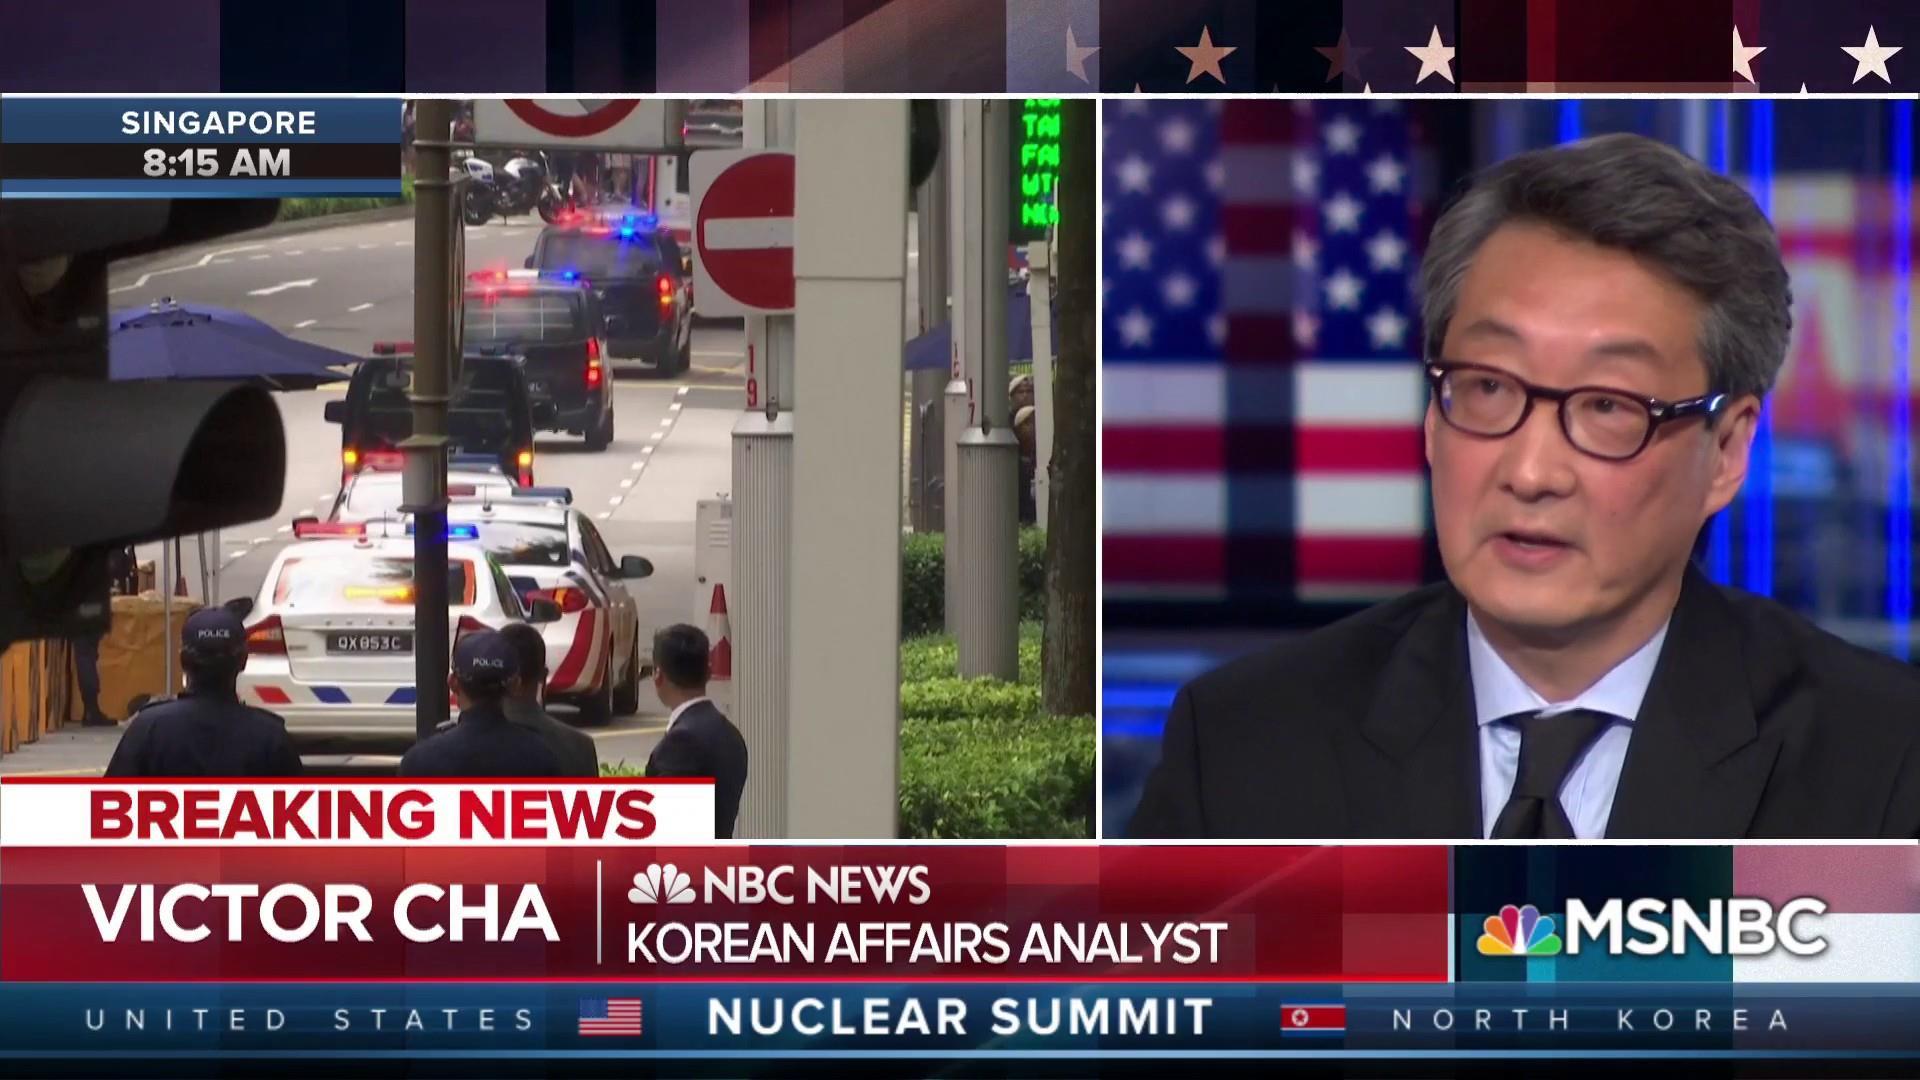 Singapore summit a big moment for Trump, huge for Kim Jong Un